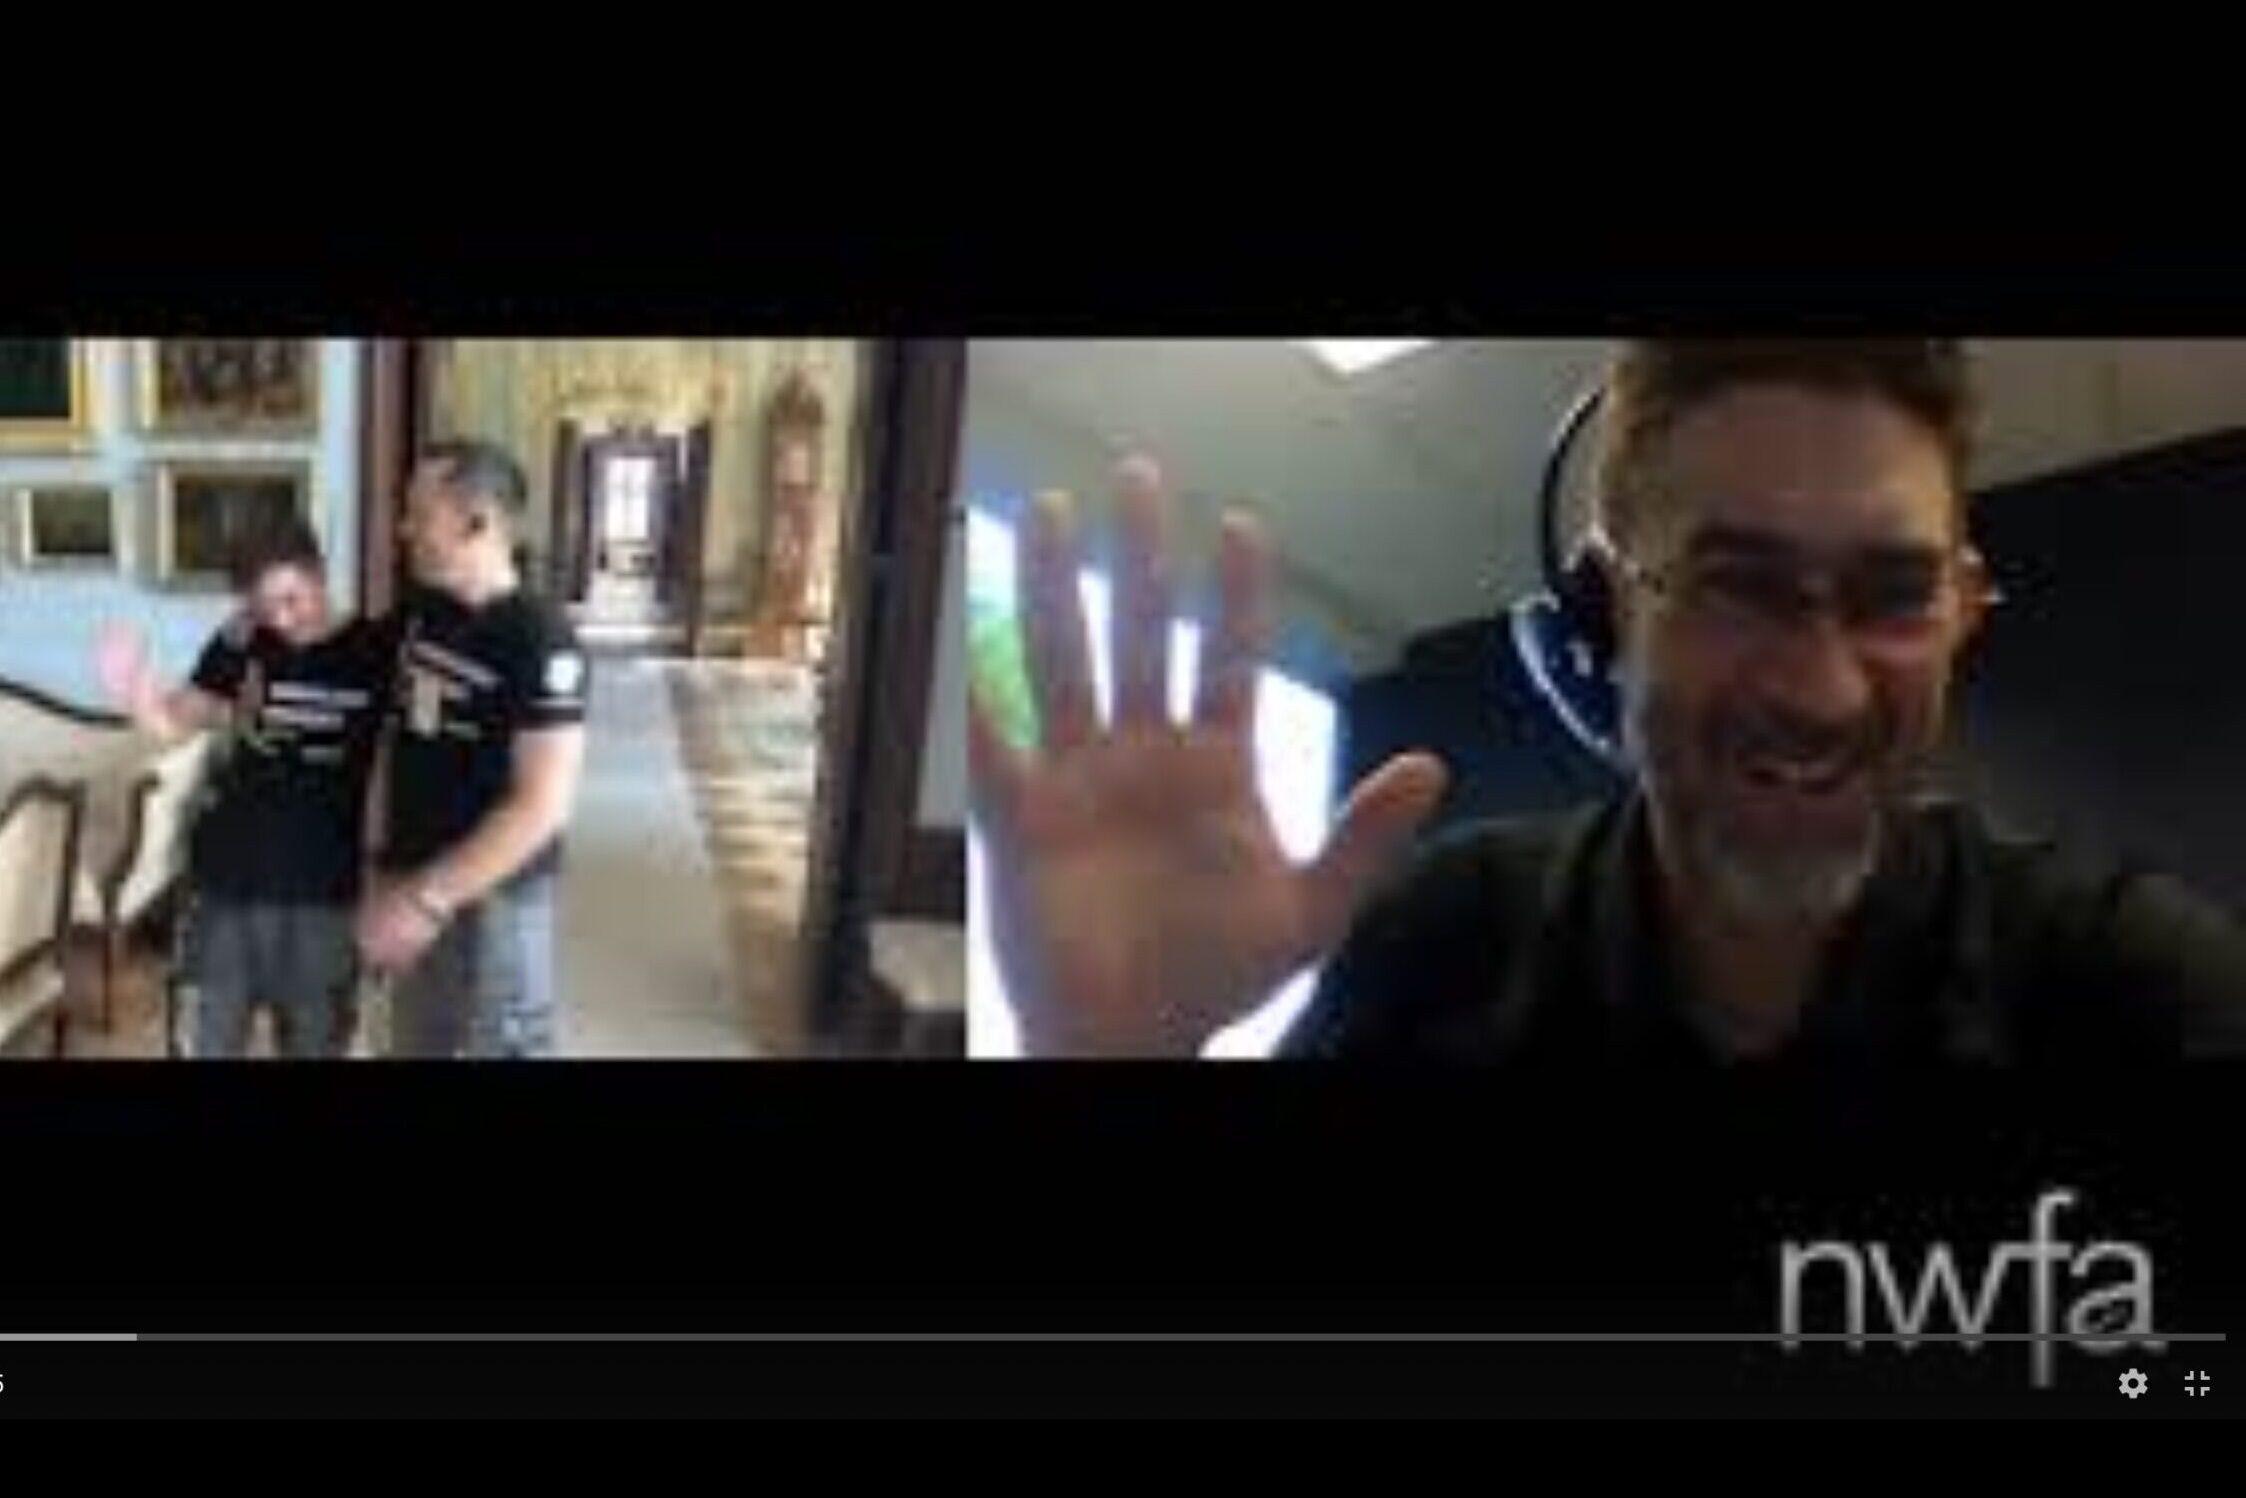 Live chat NWFA & Workcamp Parquet